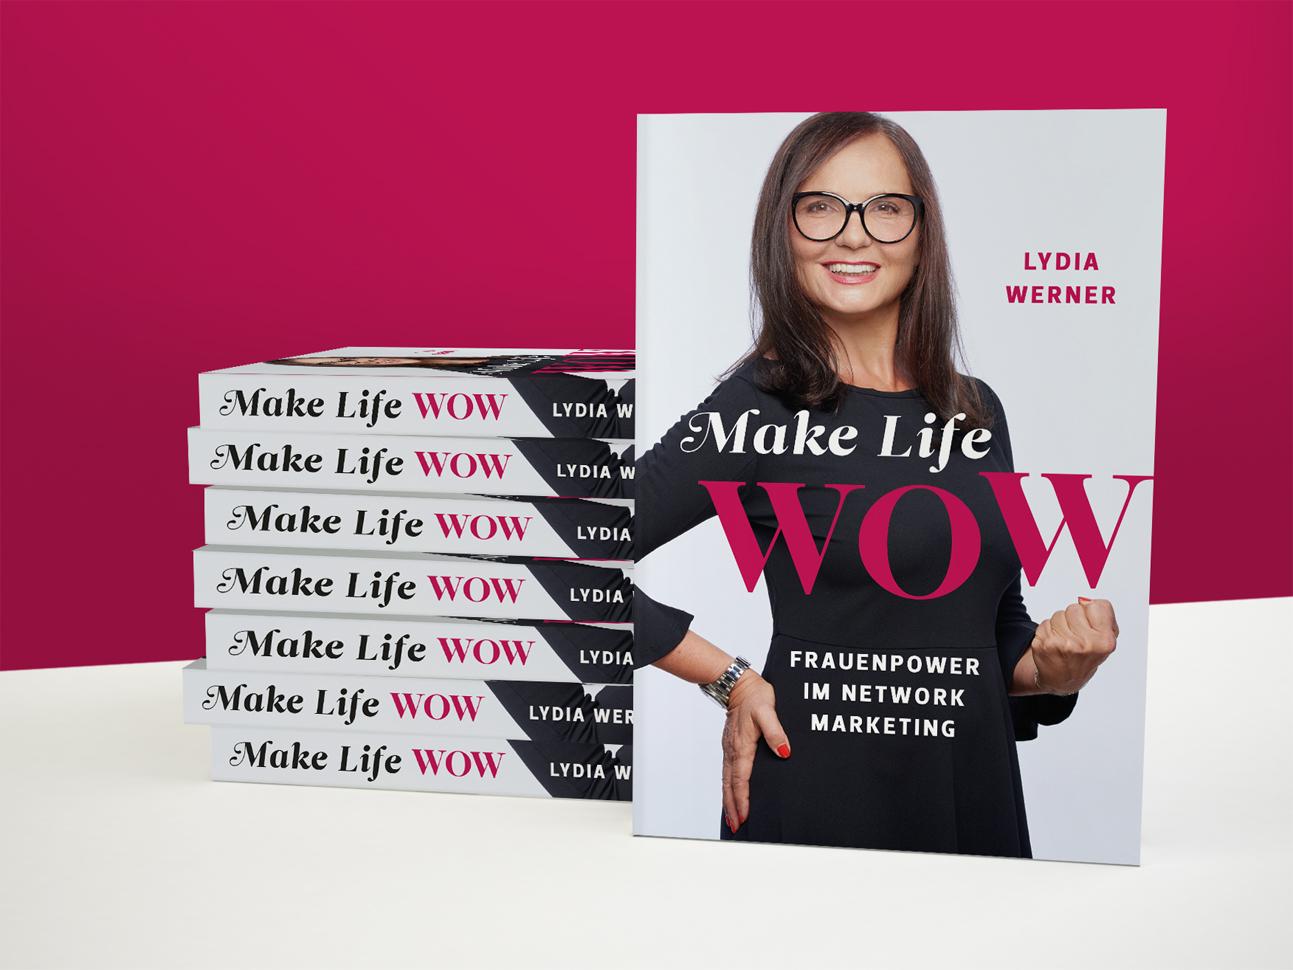 martin zech design, buecherstapel, self publishing, lydia werner, make life wow